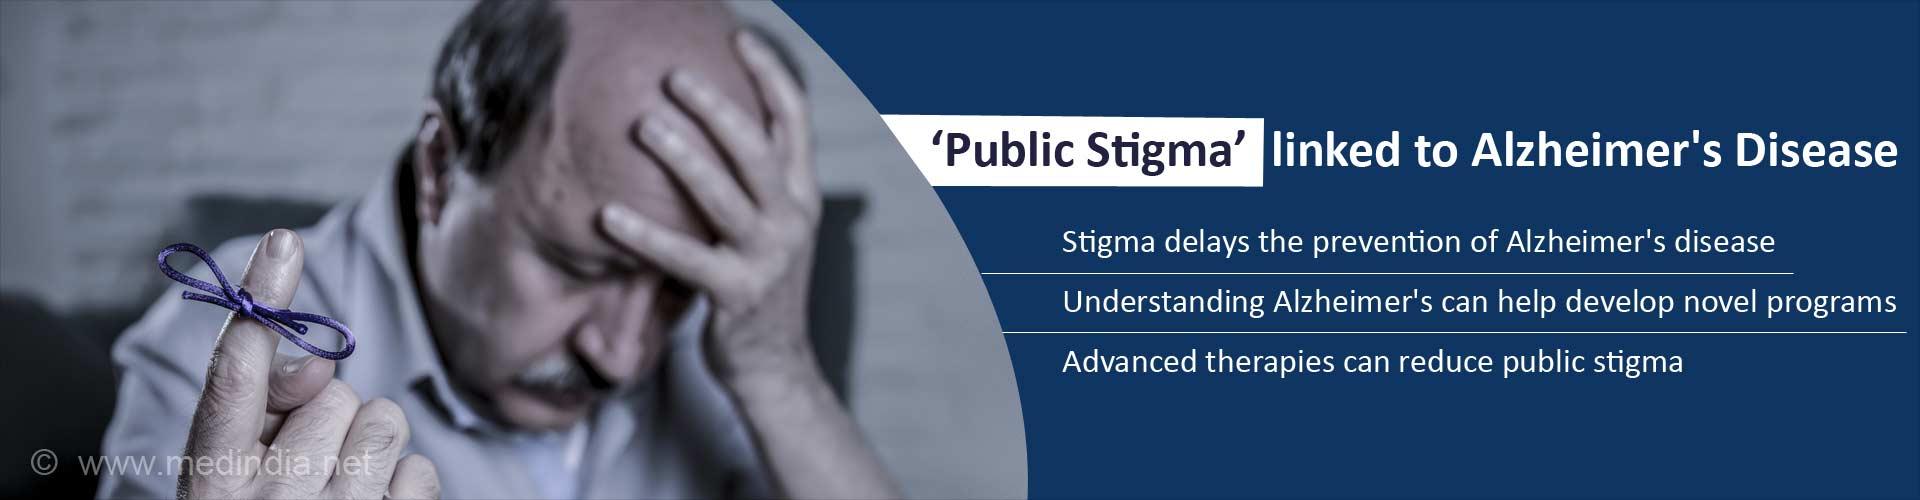 'Public Stigma' Delays Prevention of Alzheimers Disease